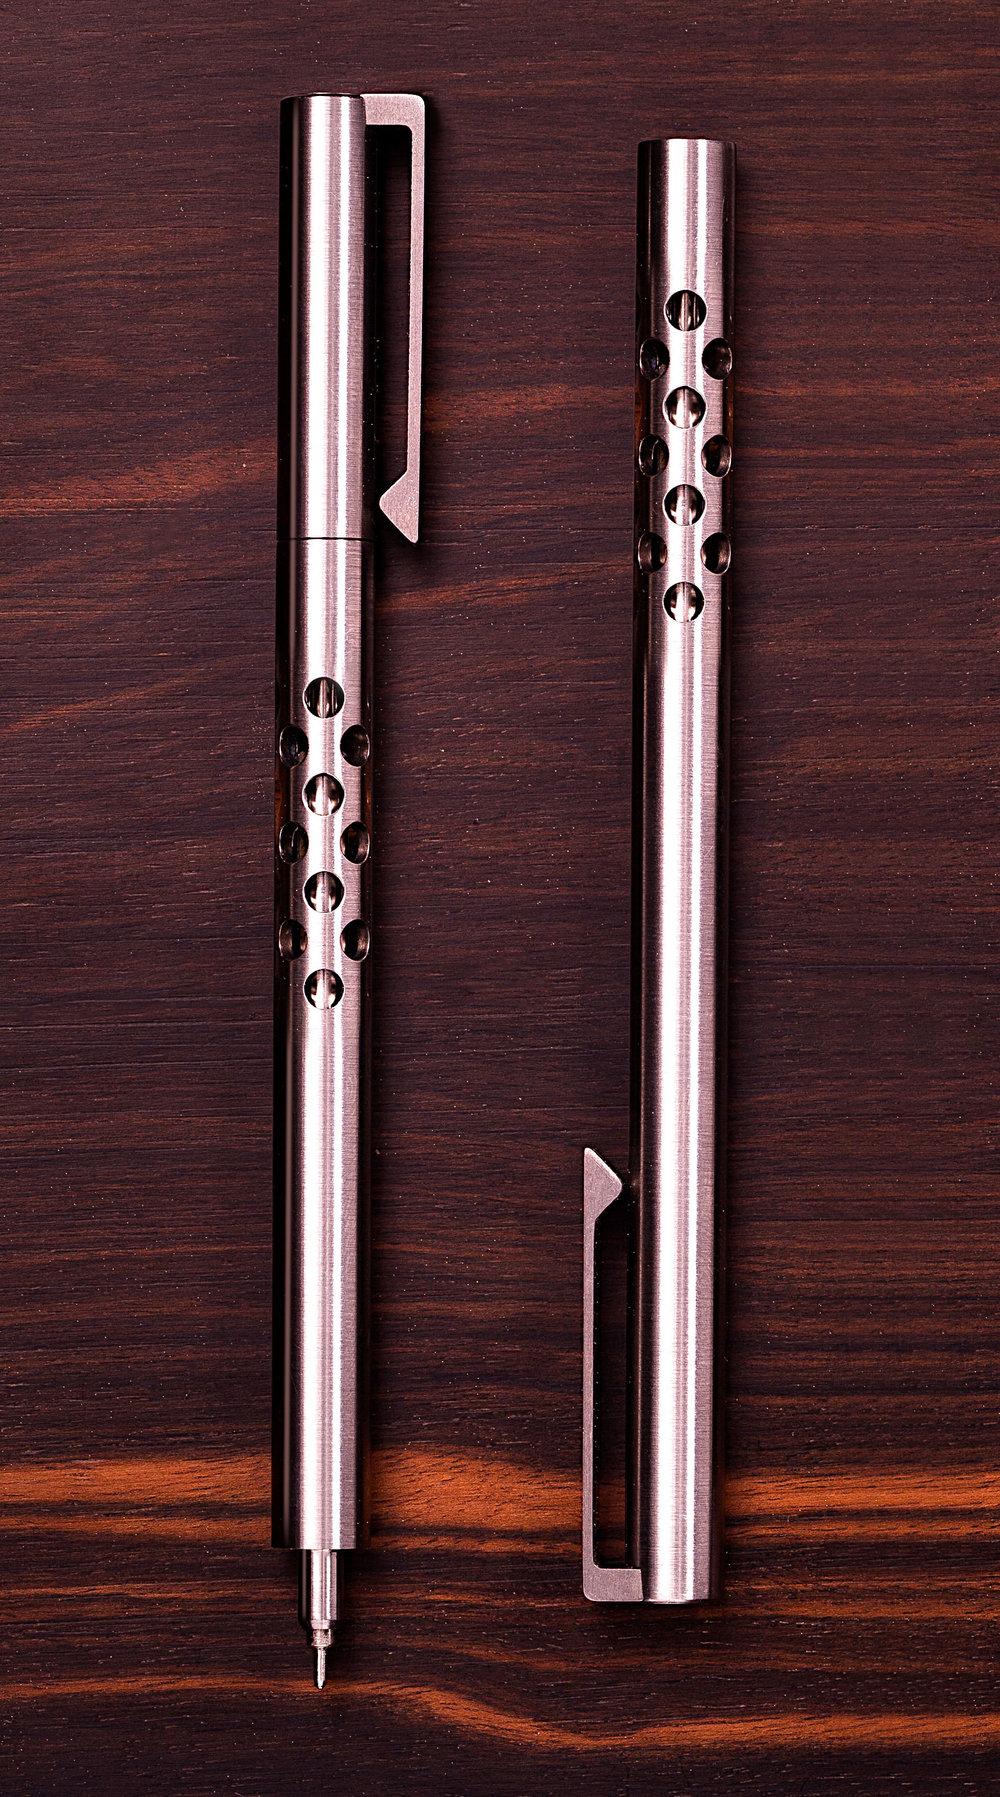 V2 - Titanium EDC Ink - CLIP version with SILENCER Option